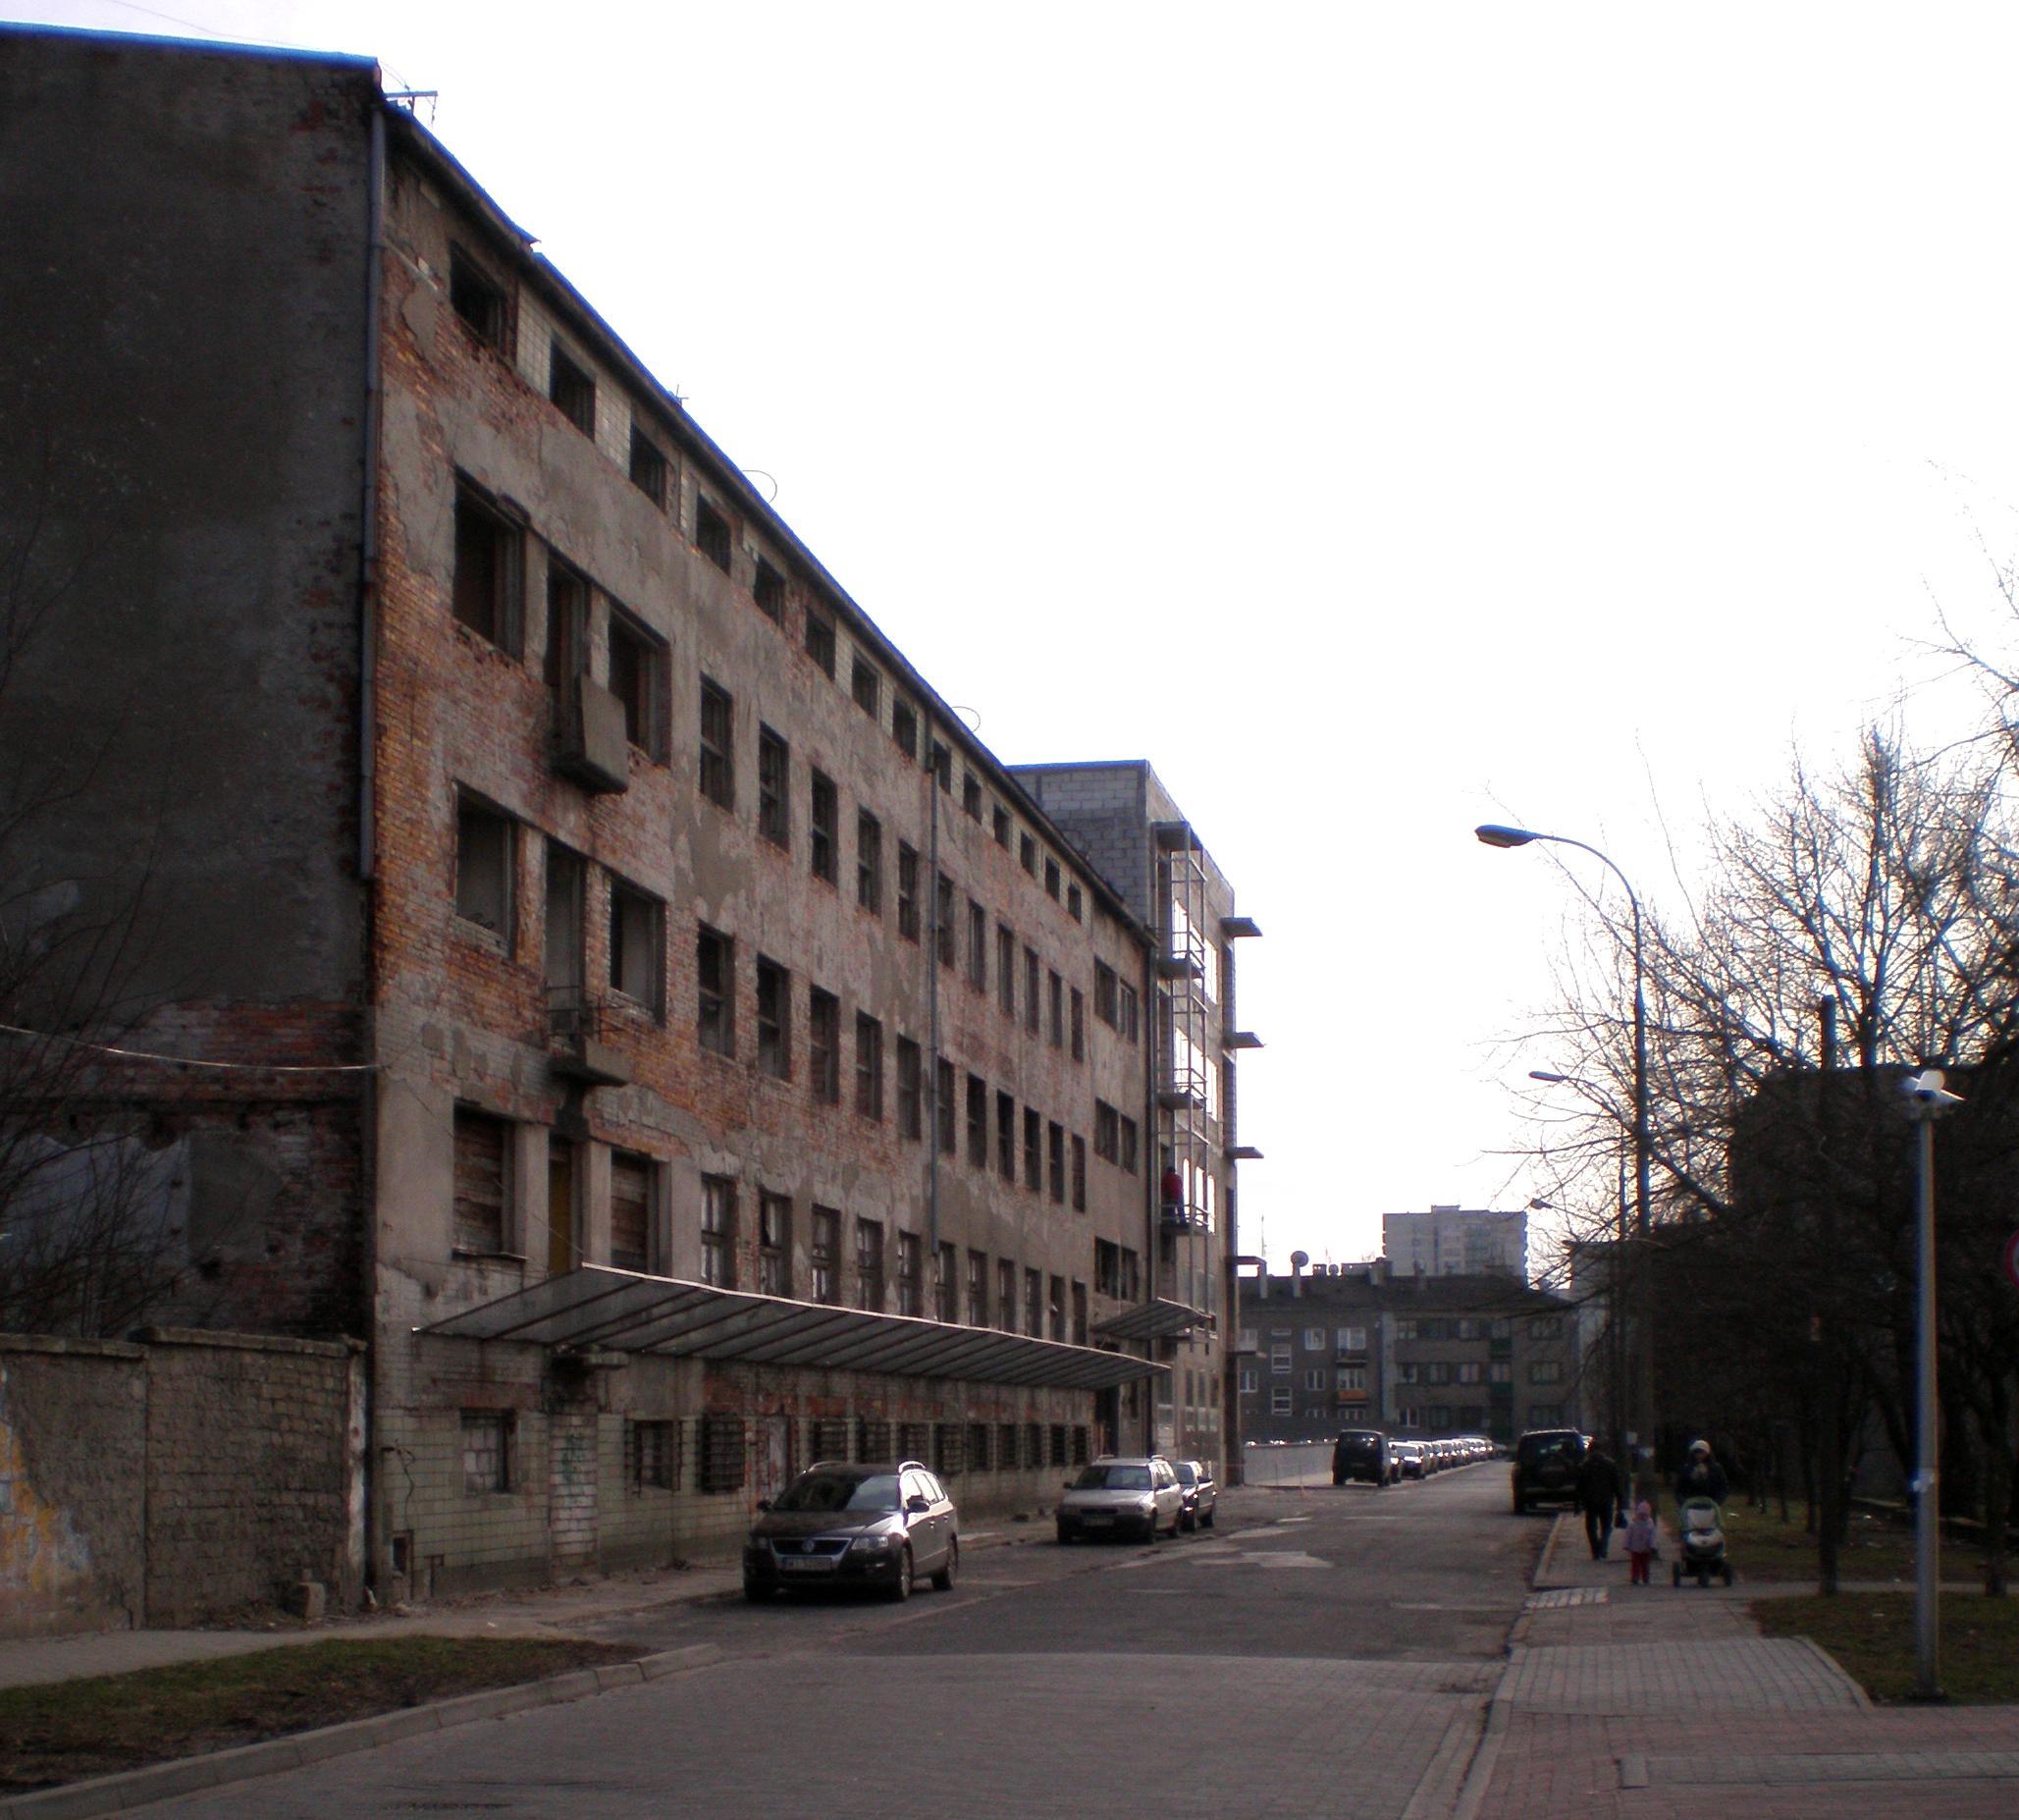 Ulica Owsiana